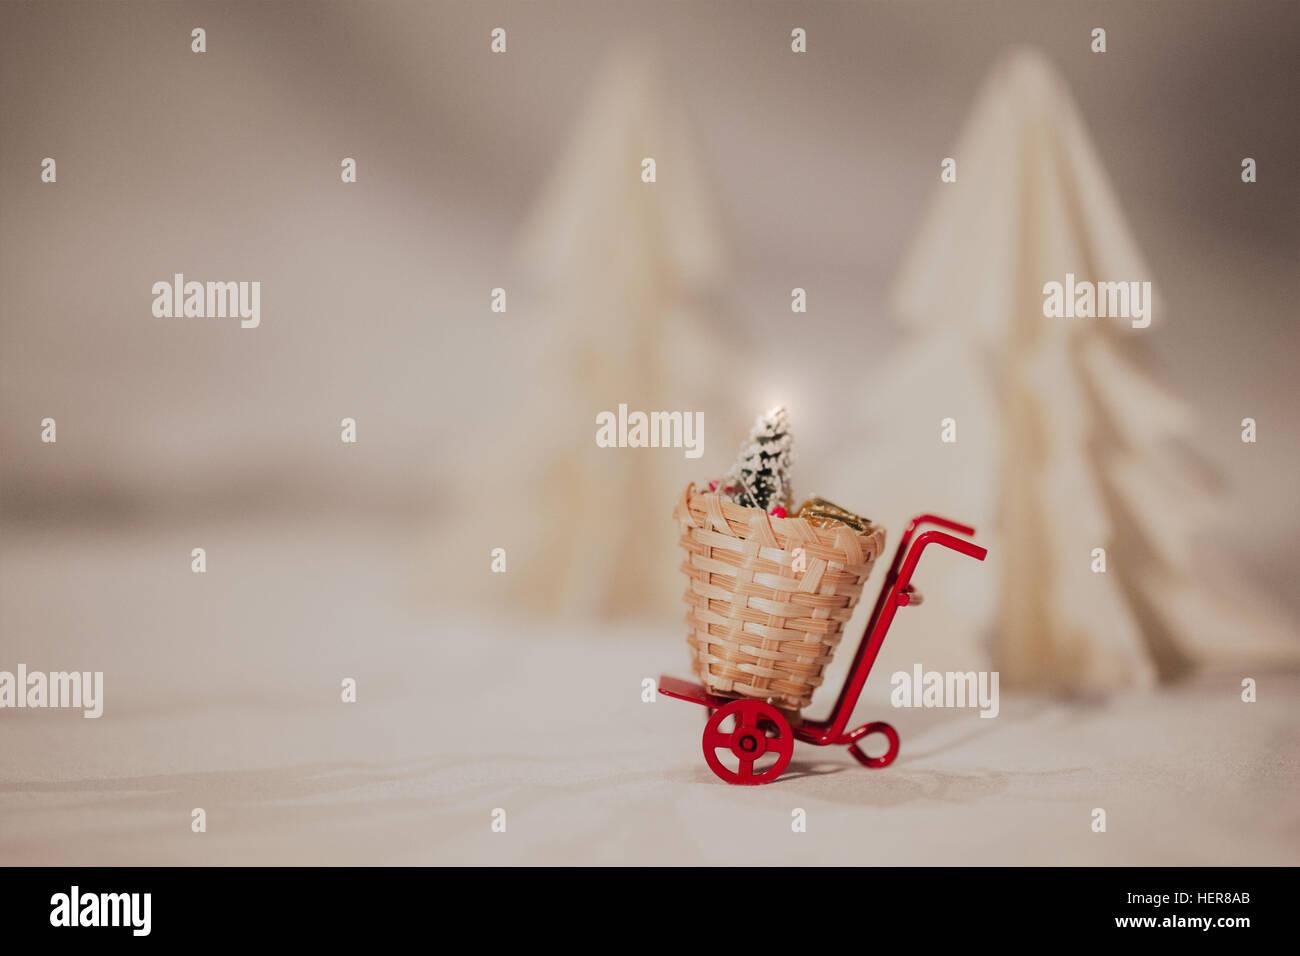 1 object,basket,beautiful,christmas,christmas tree,decoration,decorative,design,fir,handmade,isolated,japan,love,object,origami,origami - Stock Image